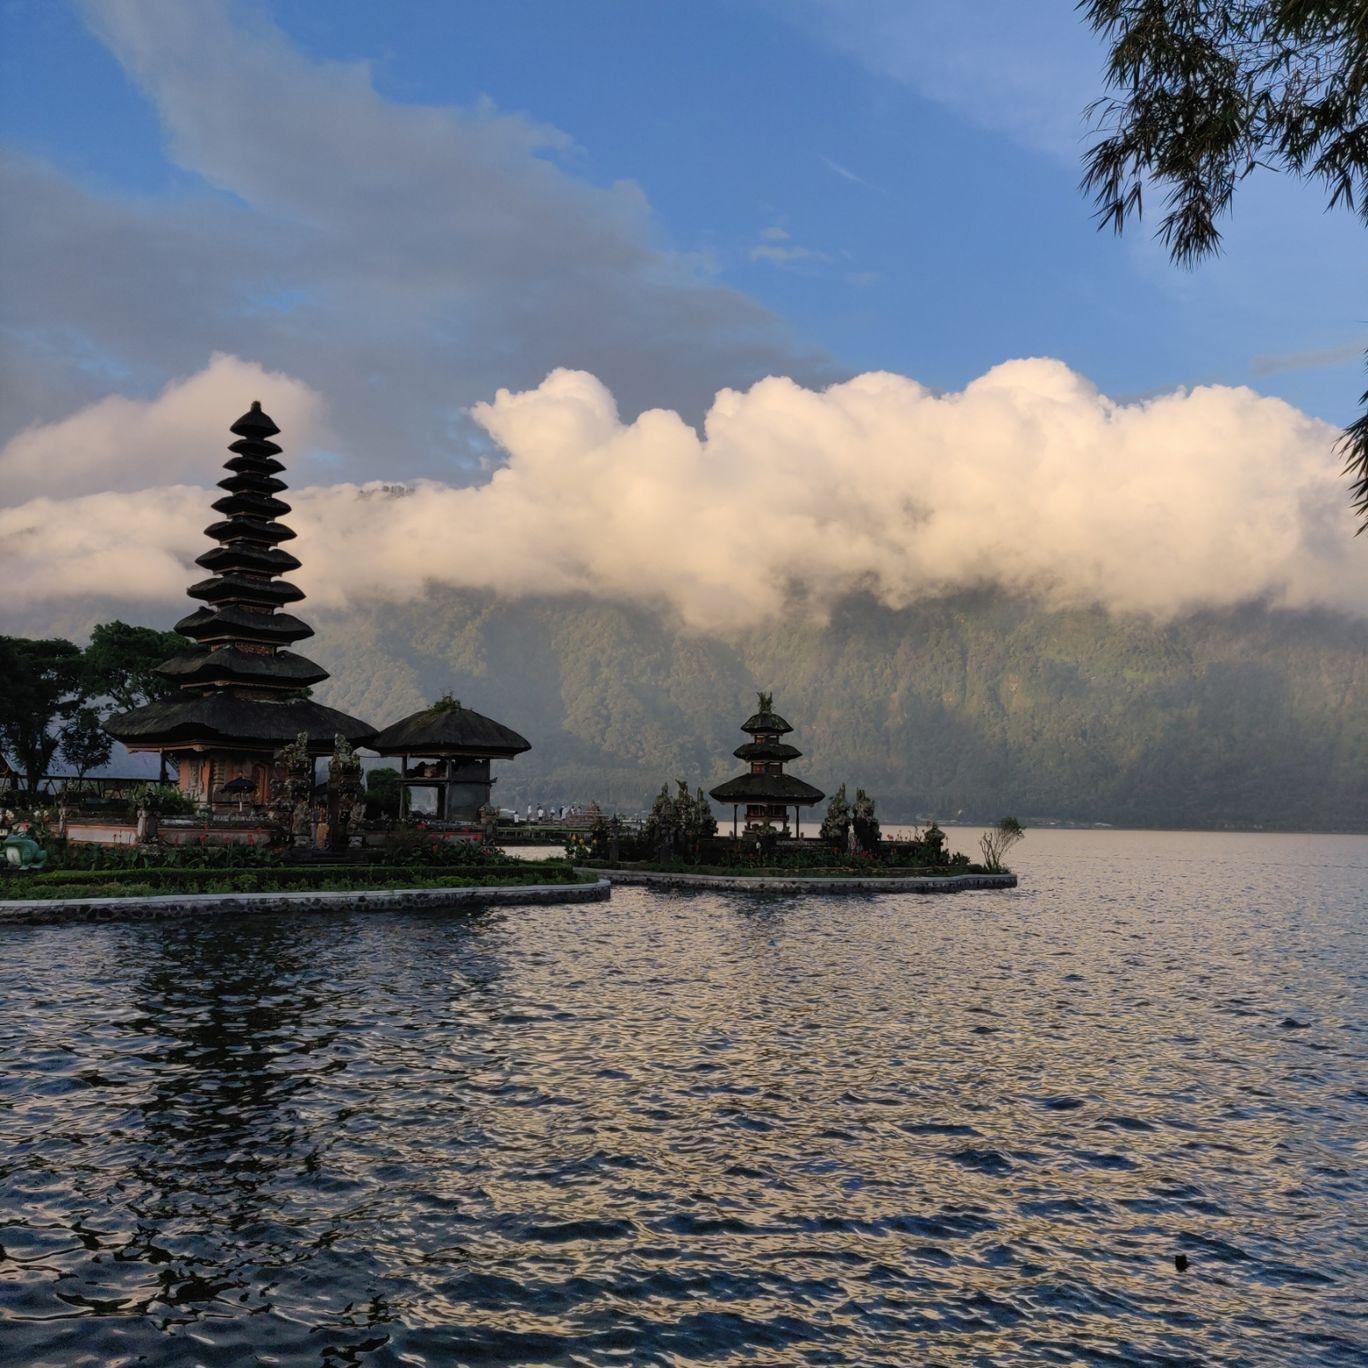 Photo of Bali By Saradhapreethi Shanmugham